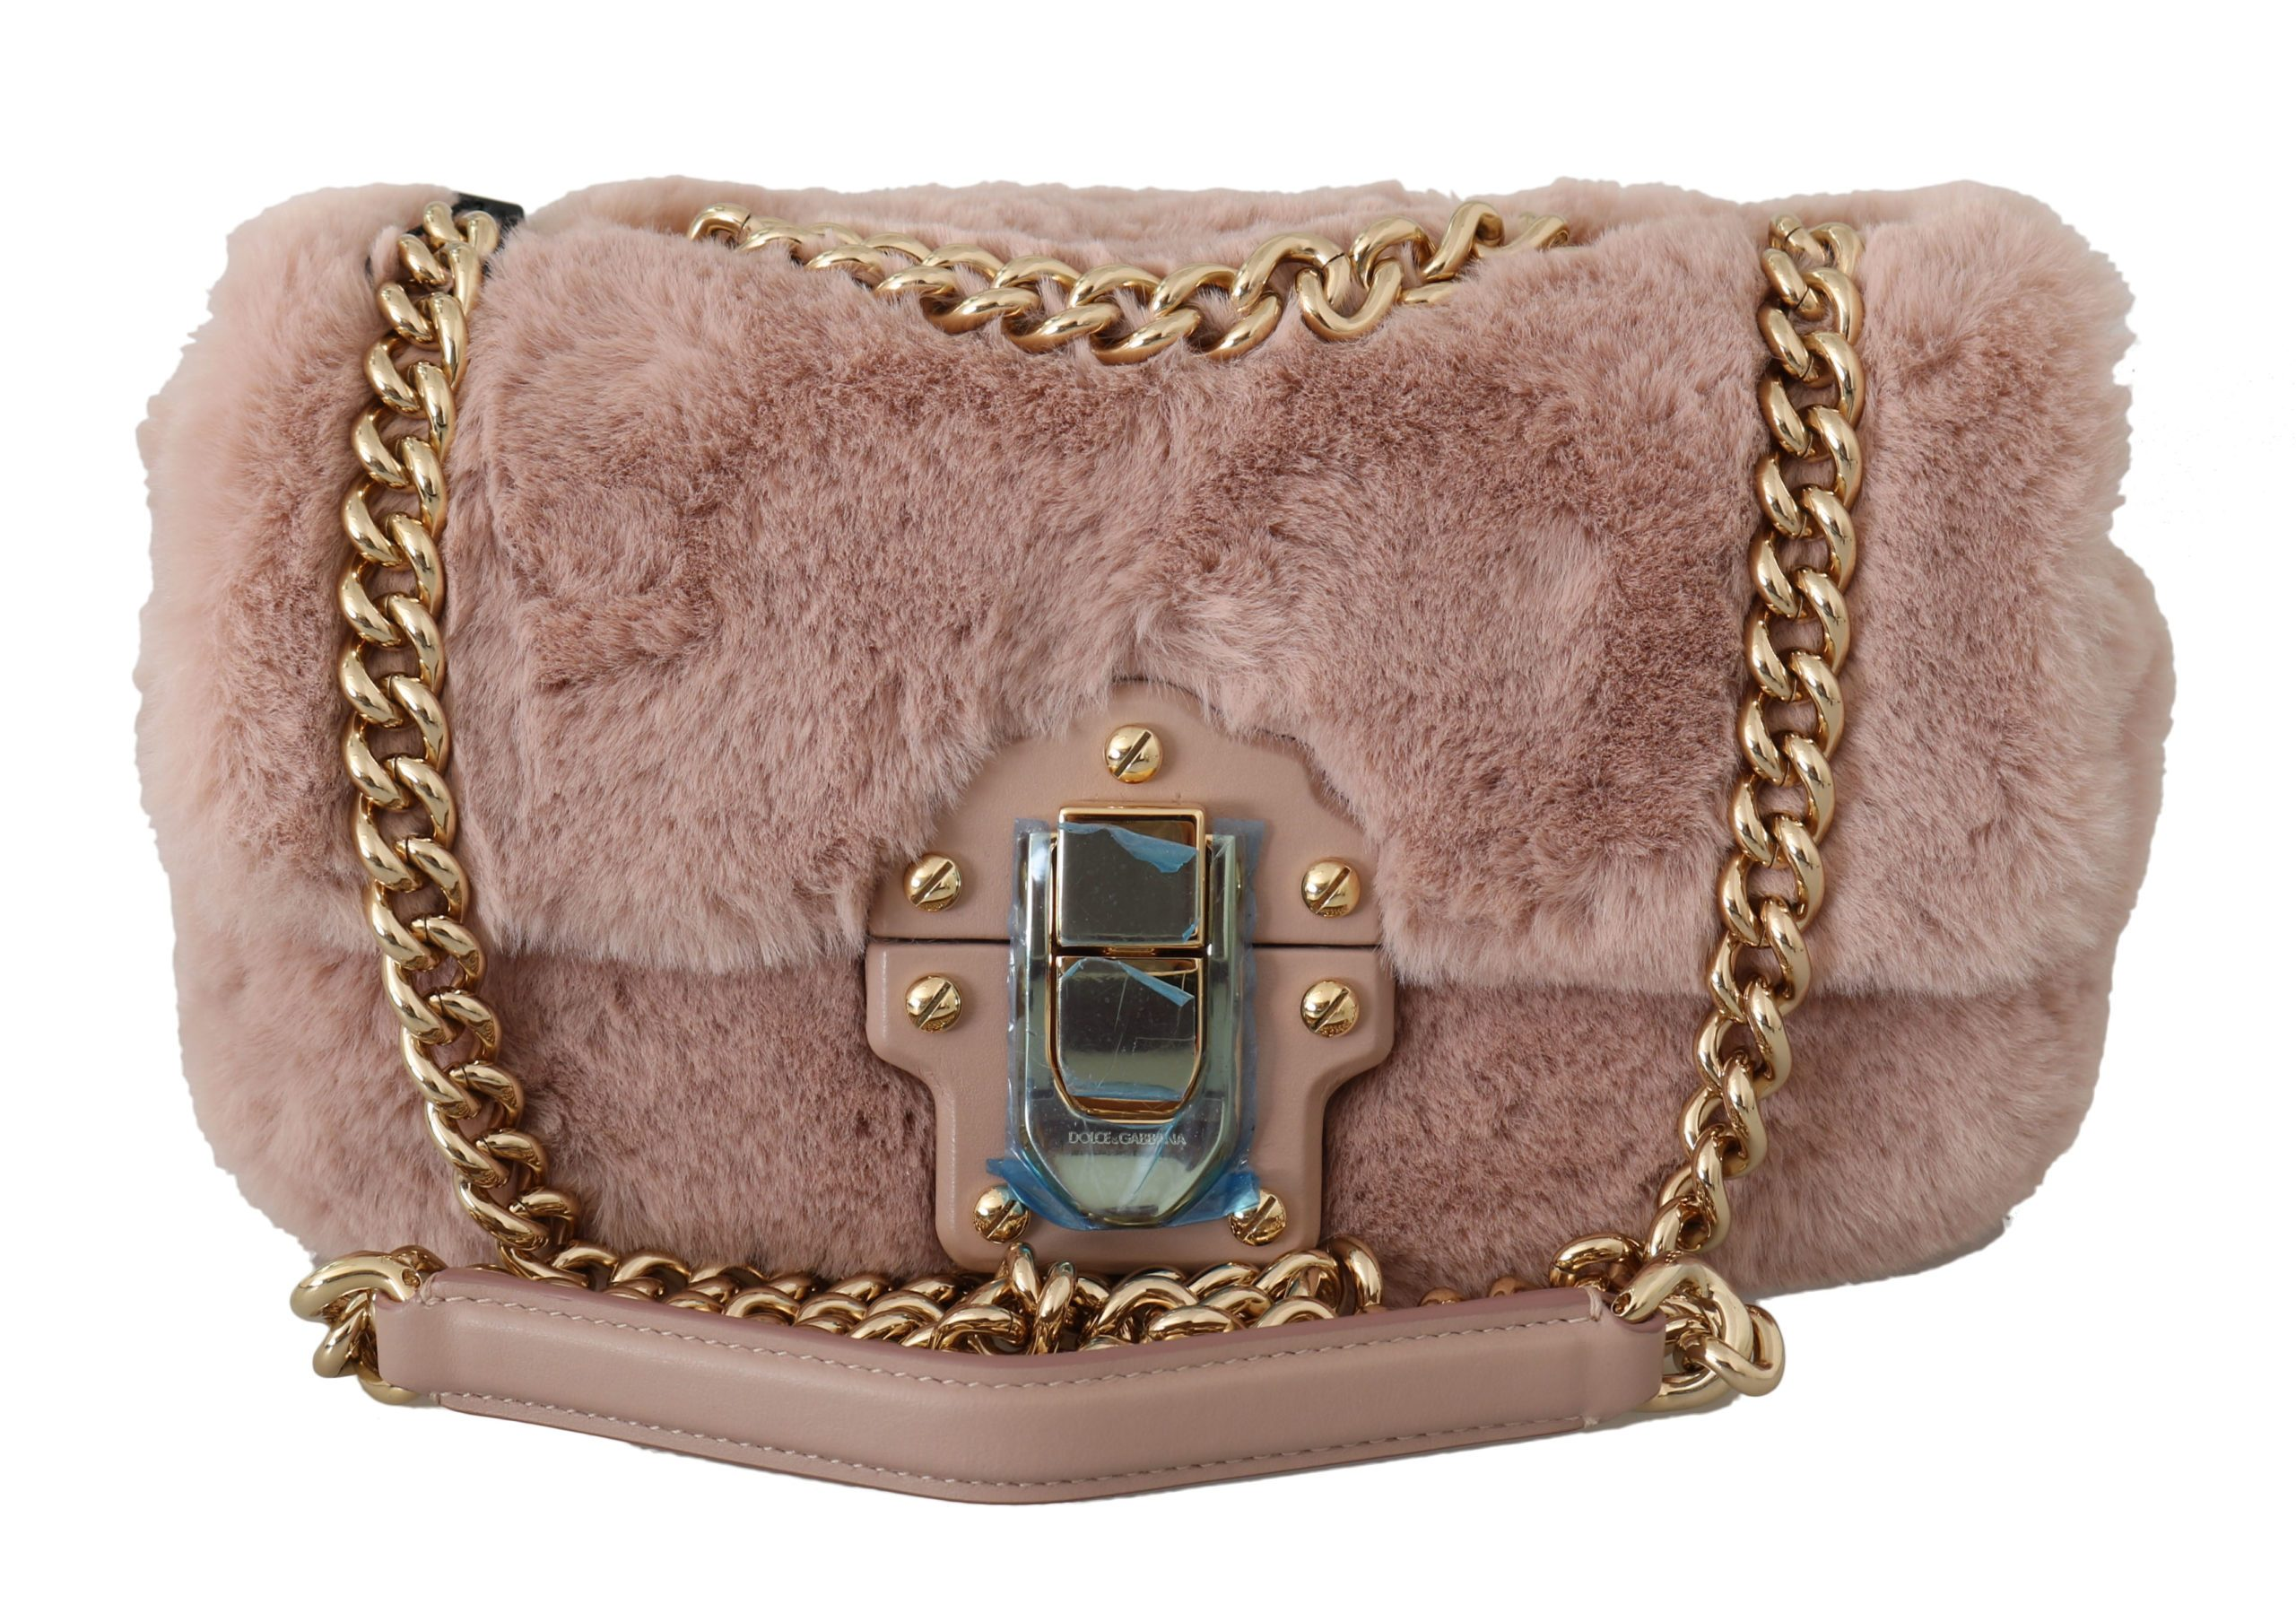 Dolce & Gabbana Women's Fur LUCIA Hand Shoulder Bag Pink VAS8747